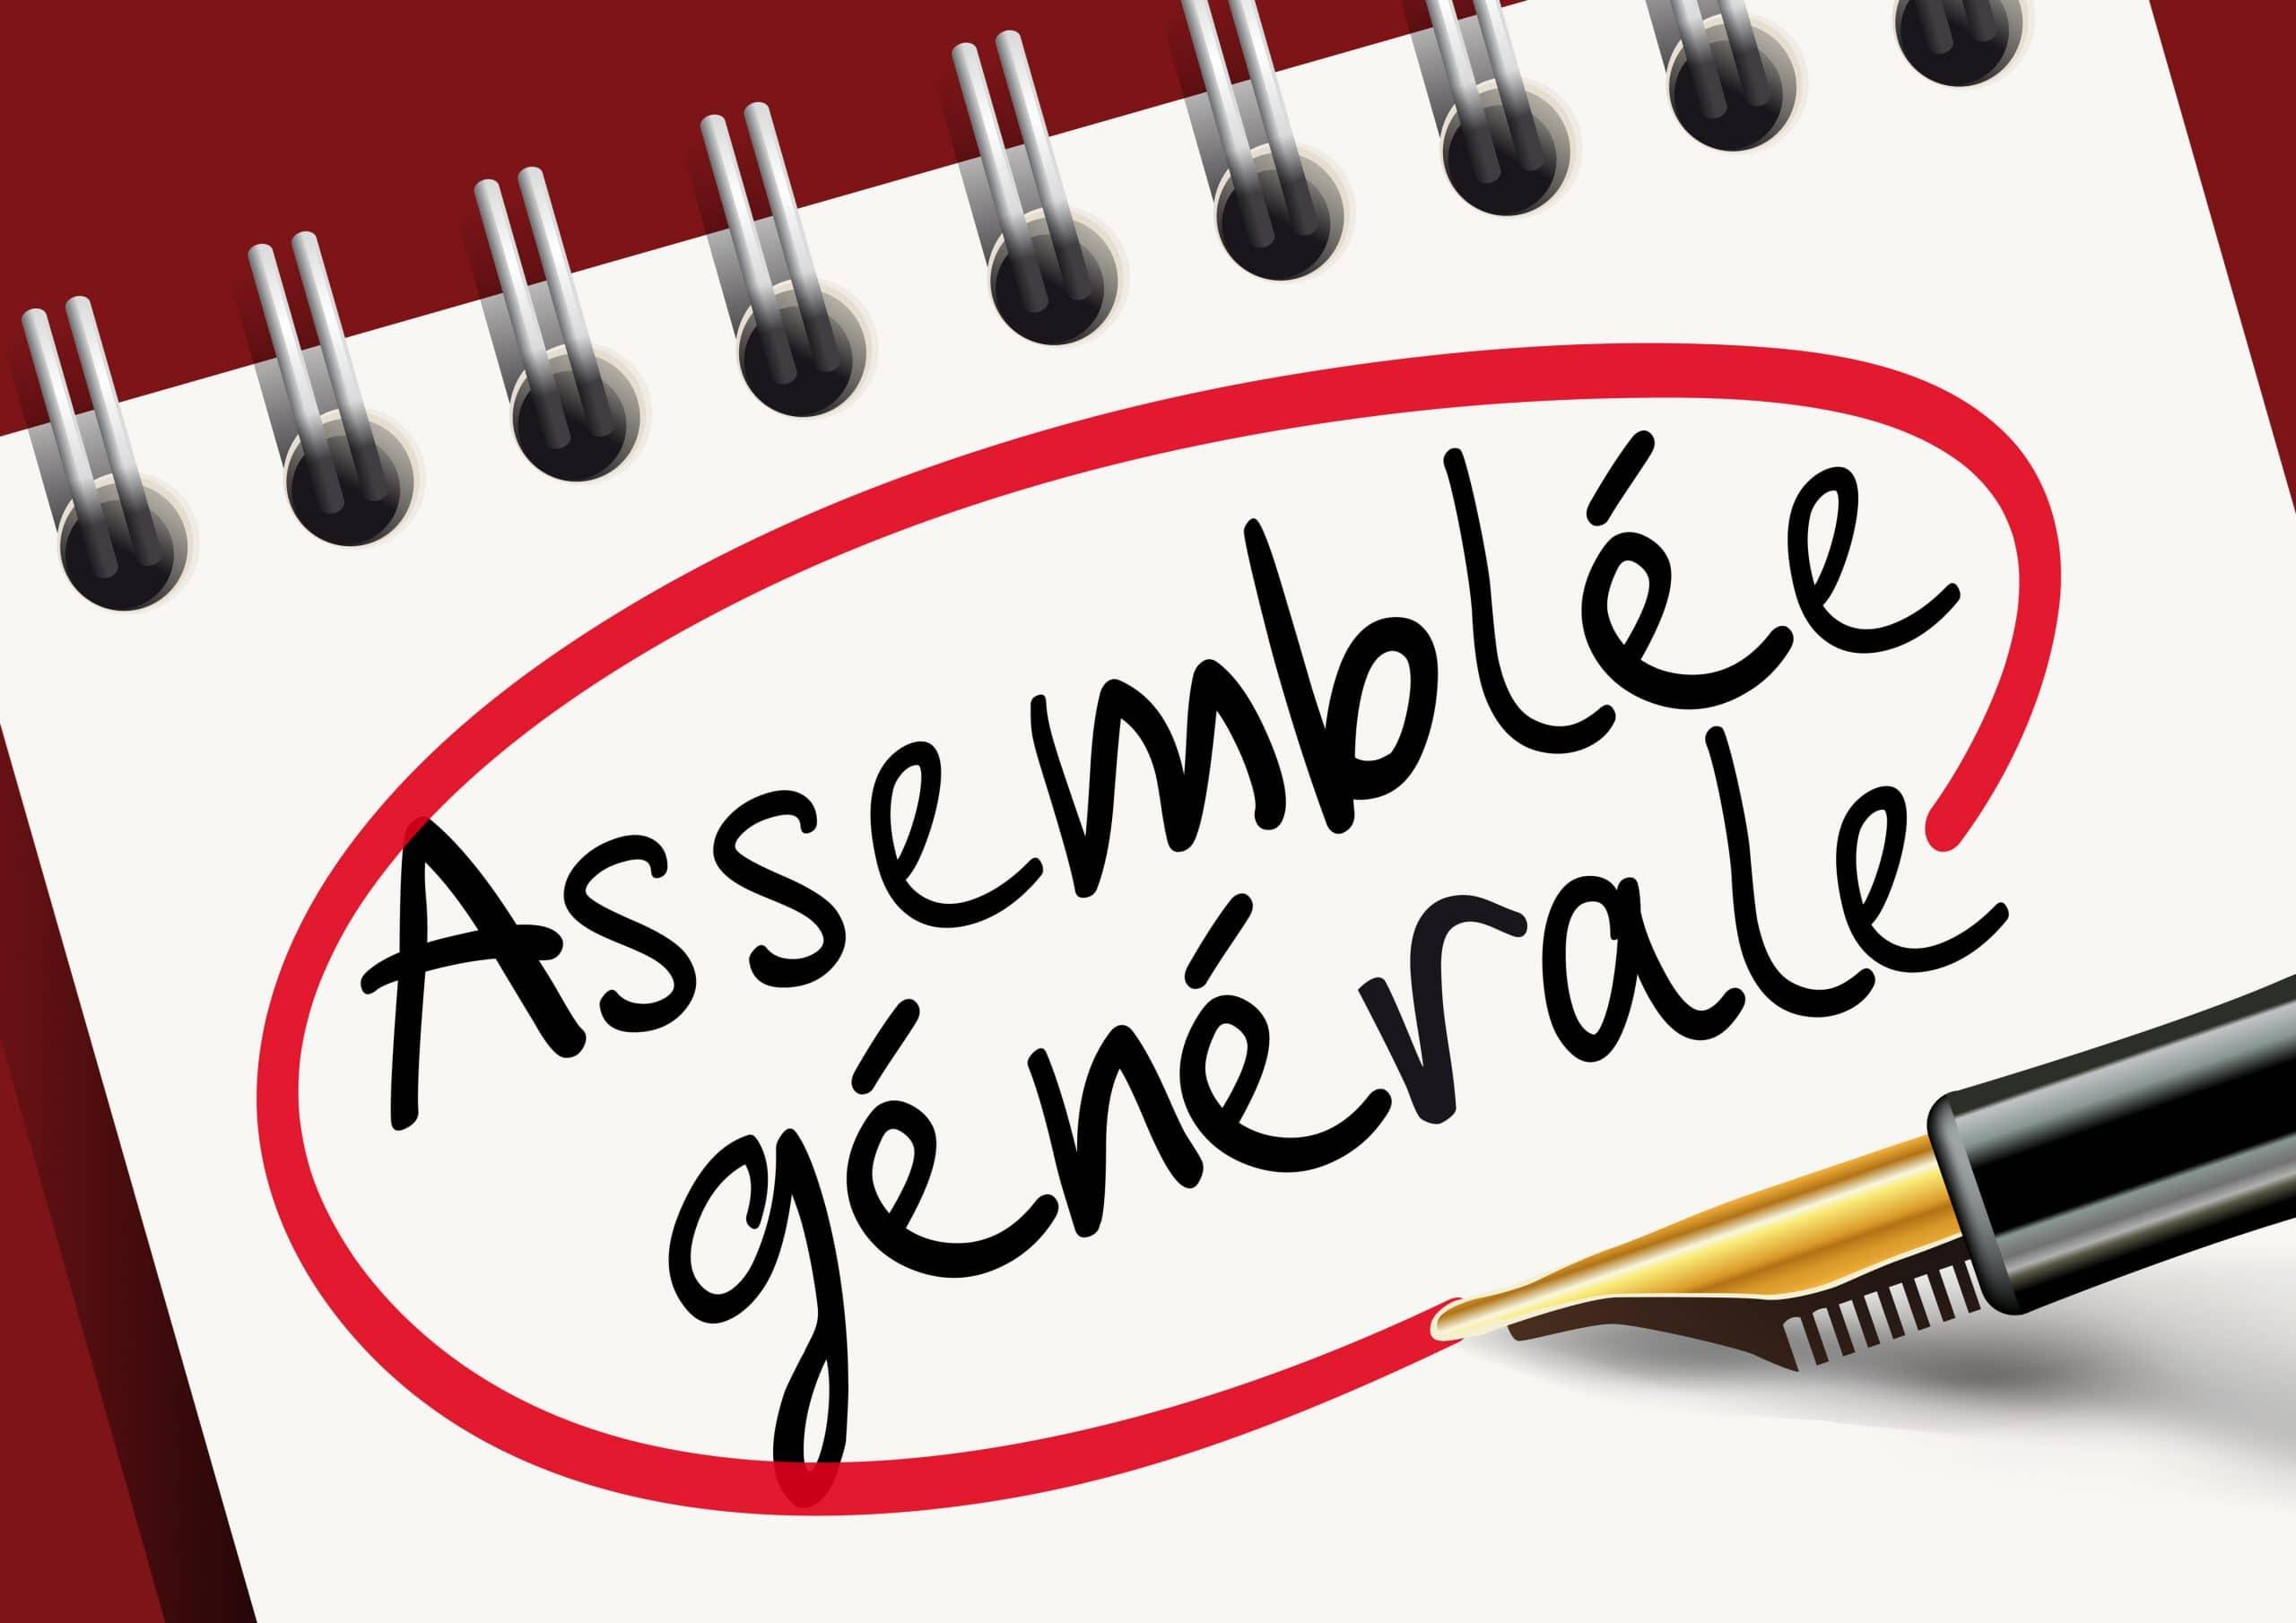 ASSEMBLEE GENERALE DU 28 OCTOBRE 2018